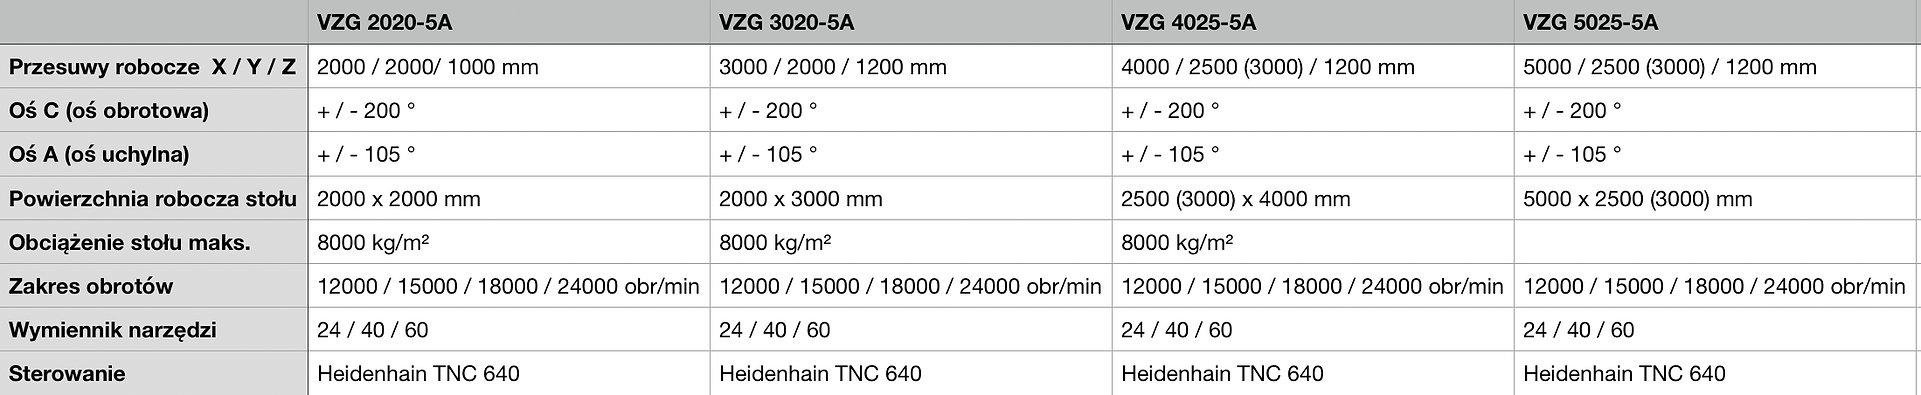 VZG 5A_PL.jpg